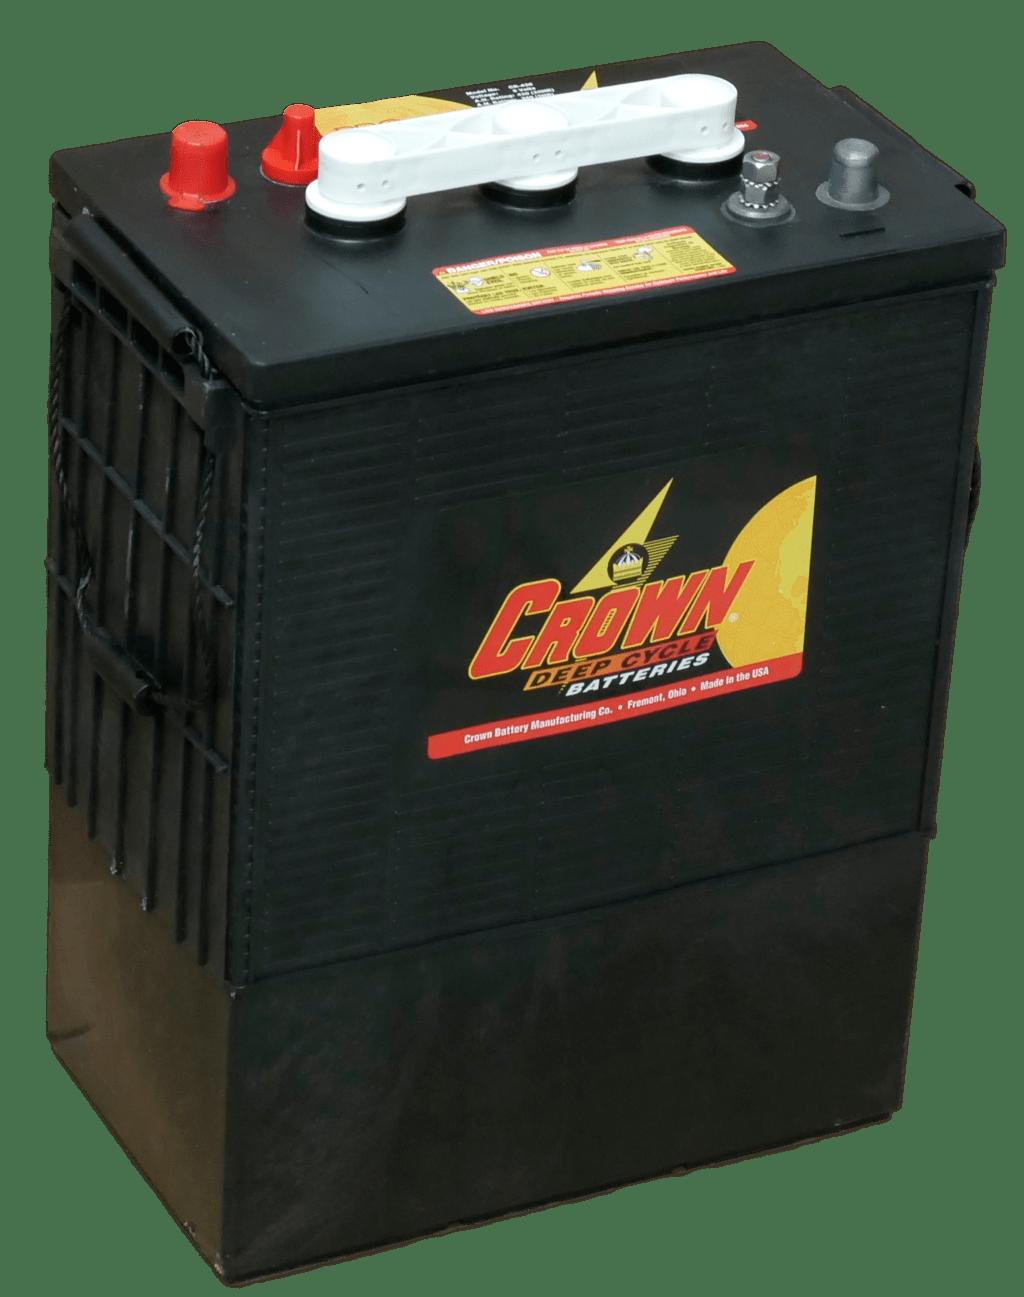 Crown 860 AH 12 VDC 10,320 Wh (4) Battery Bank